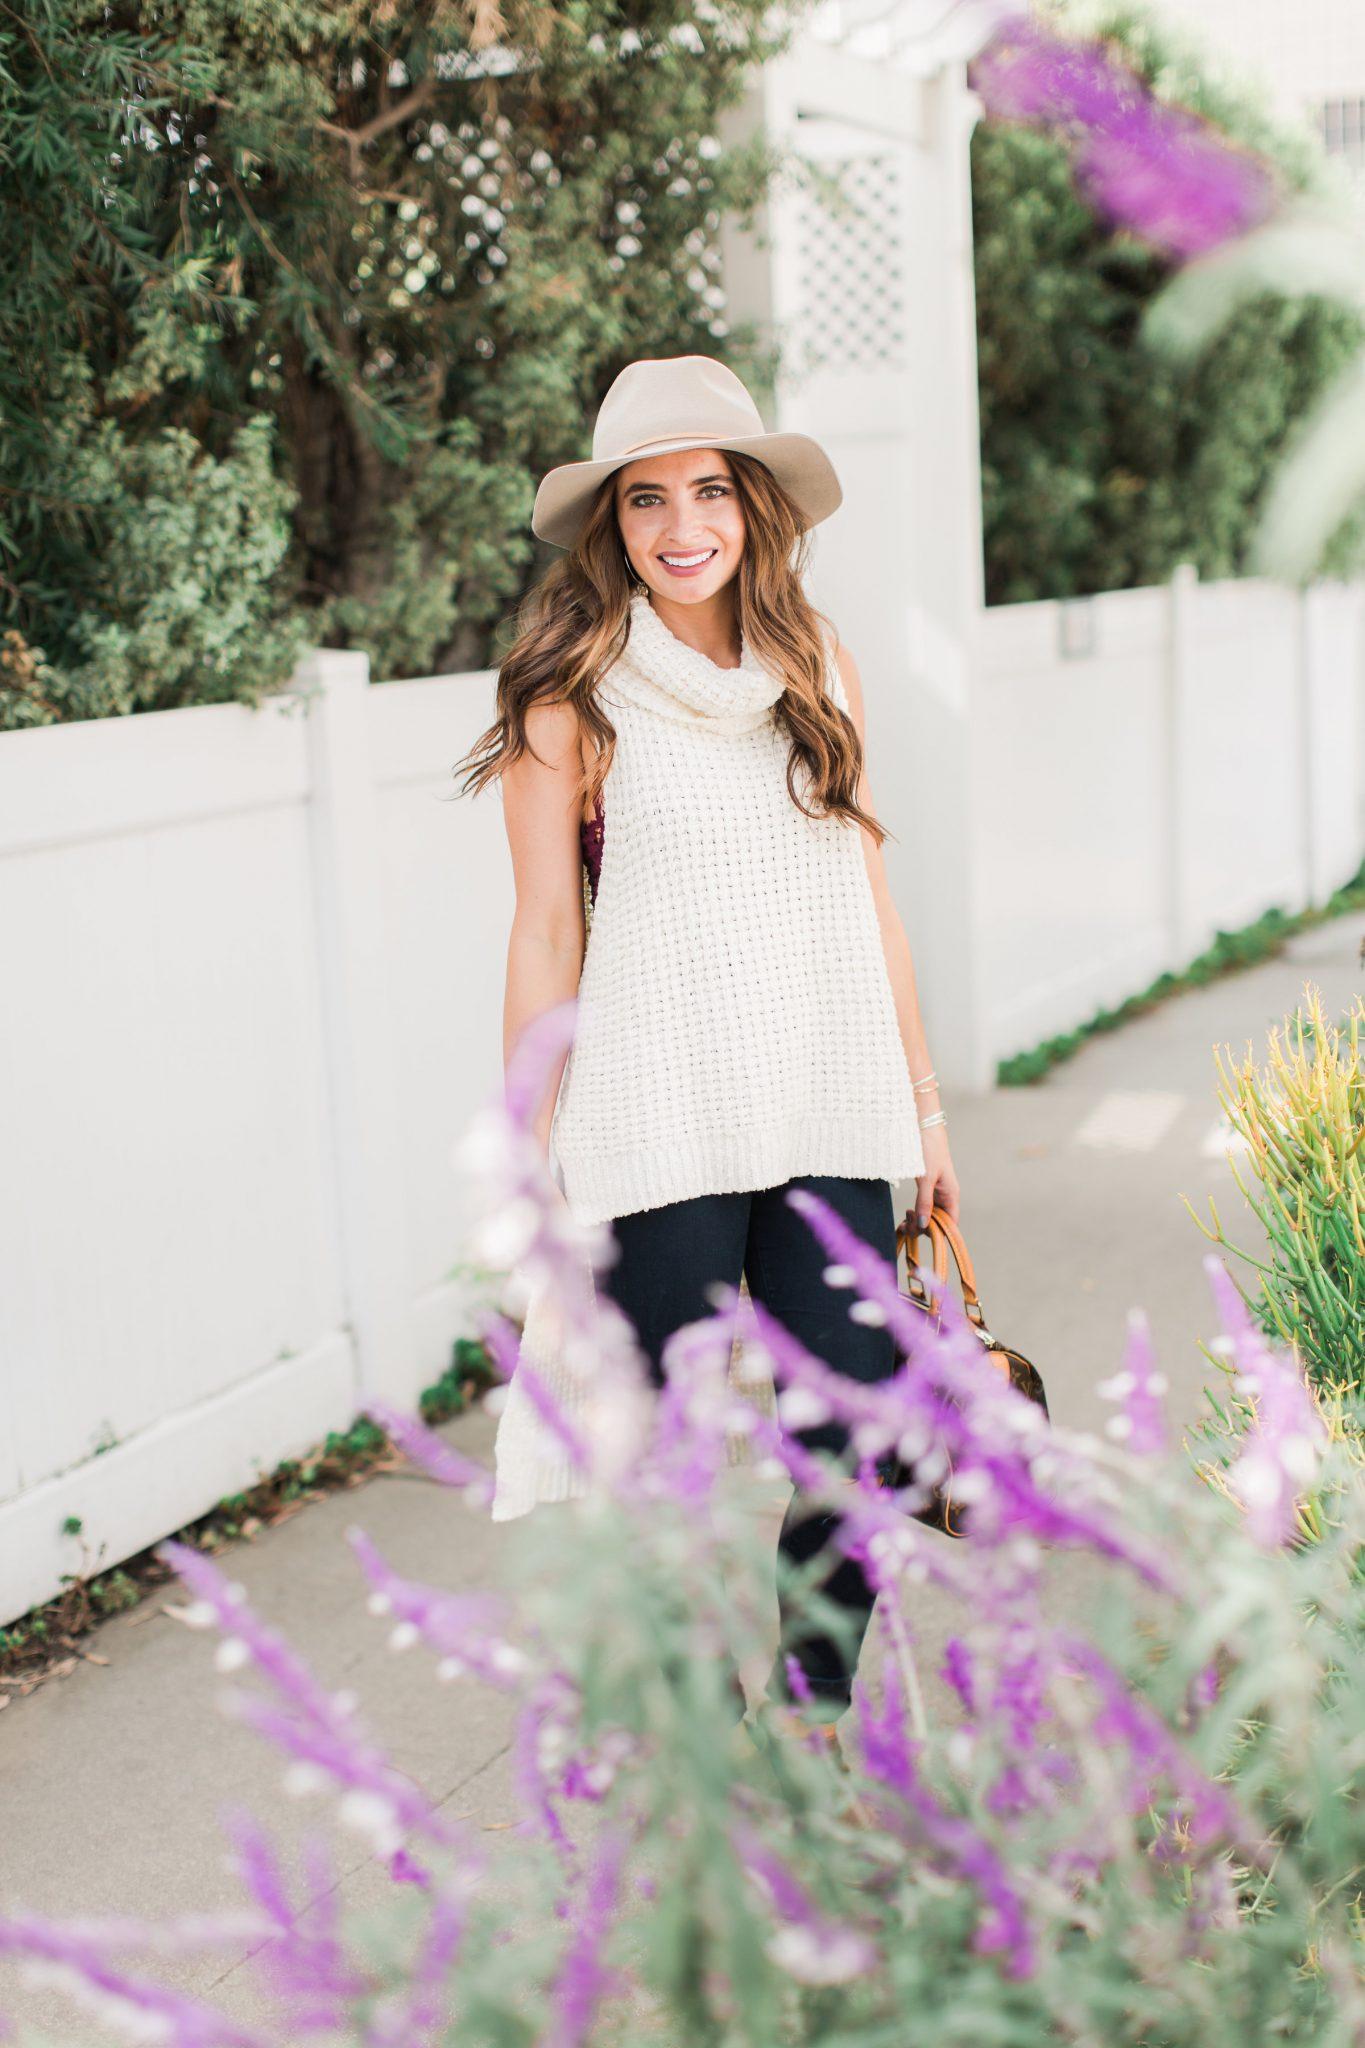 Fall Style - sleeveless turtleneck, distressed denim, tan hat   Maxie Elle - Fall Layering Top by popular Orange County fashion blogger Maxie Elle